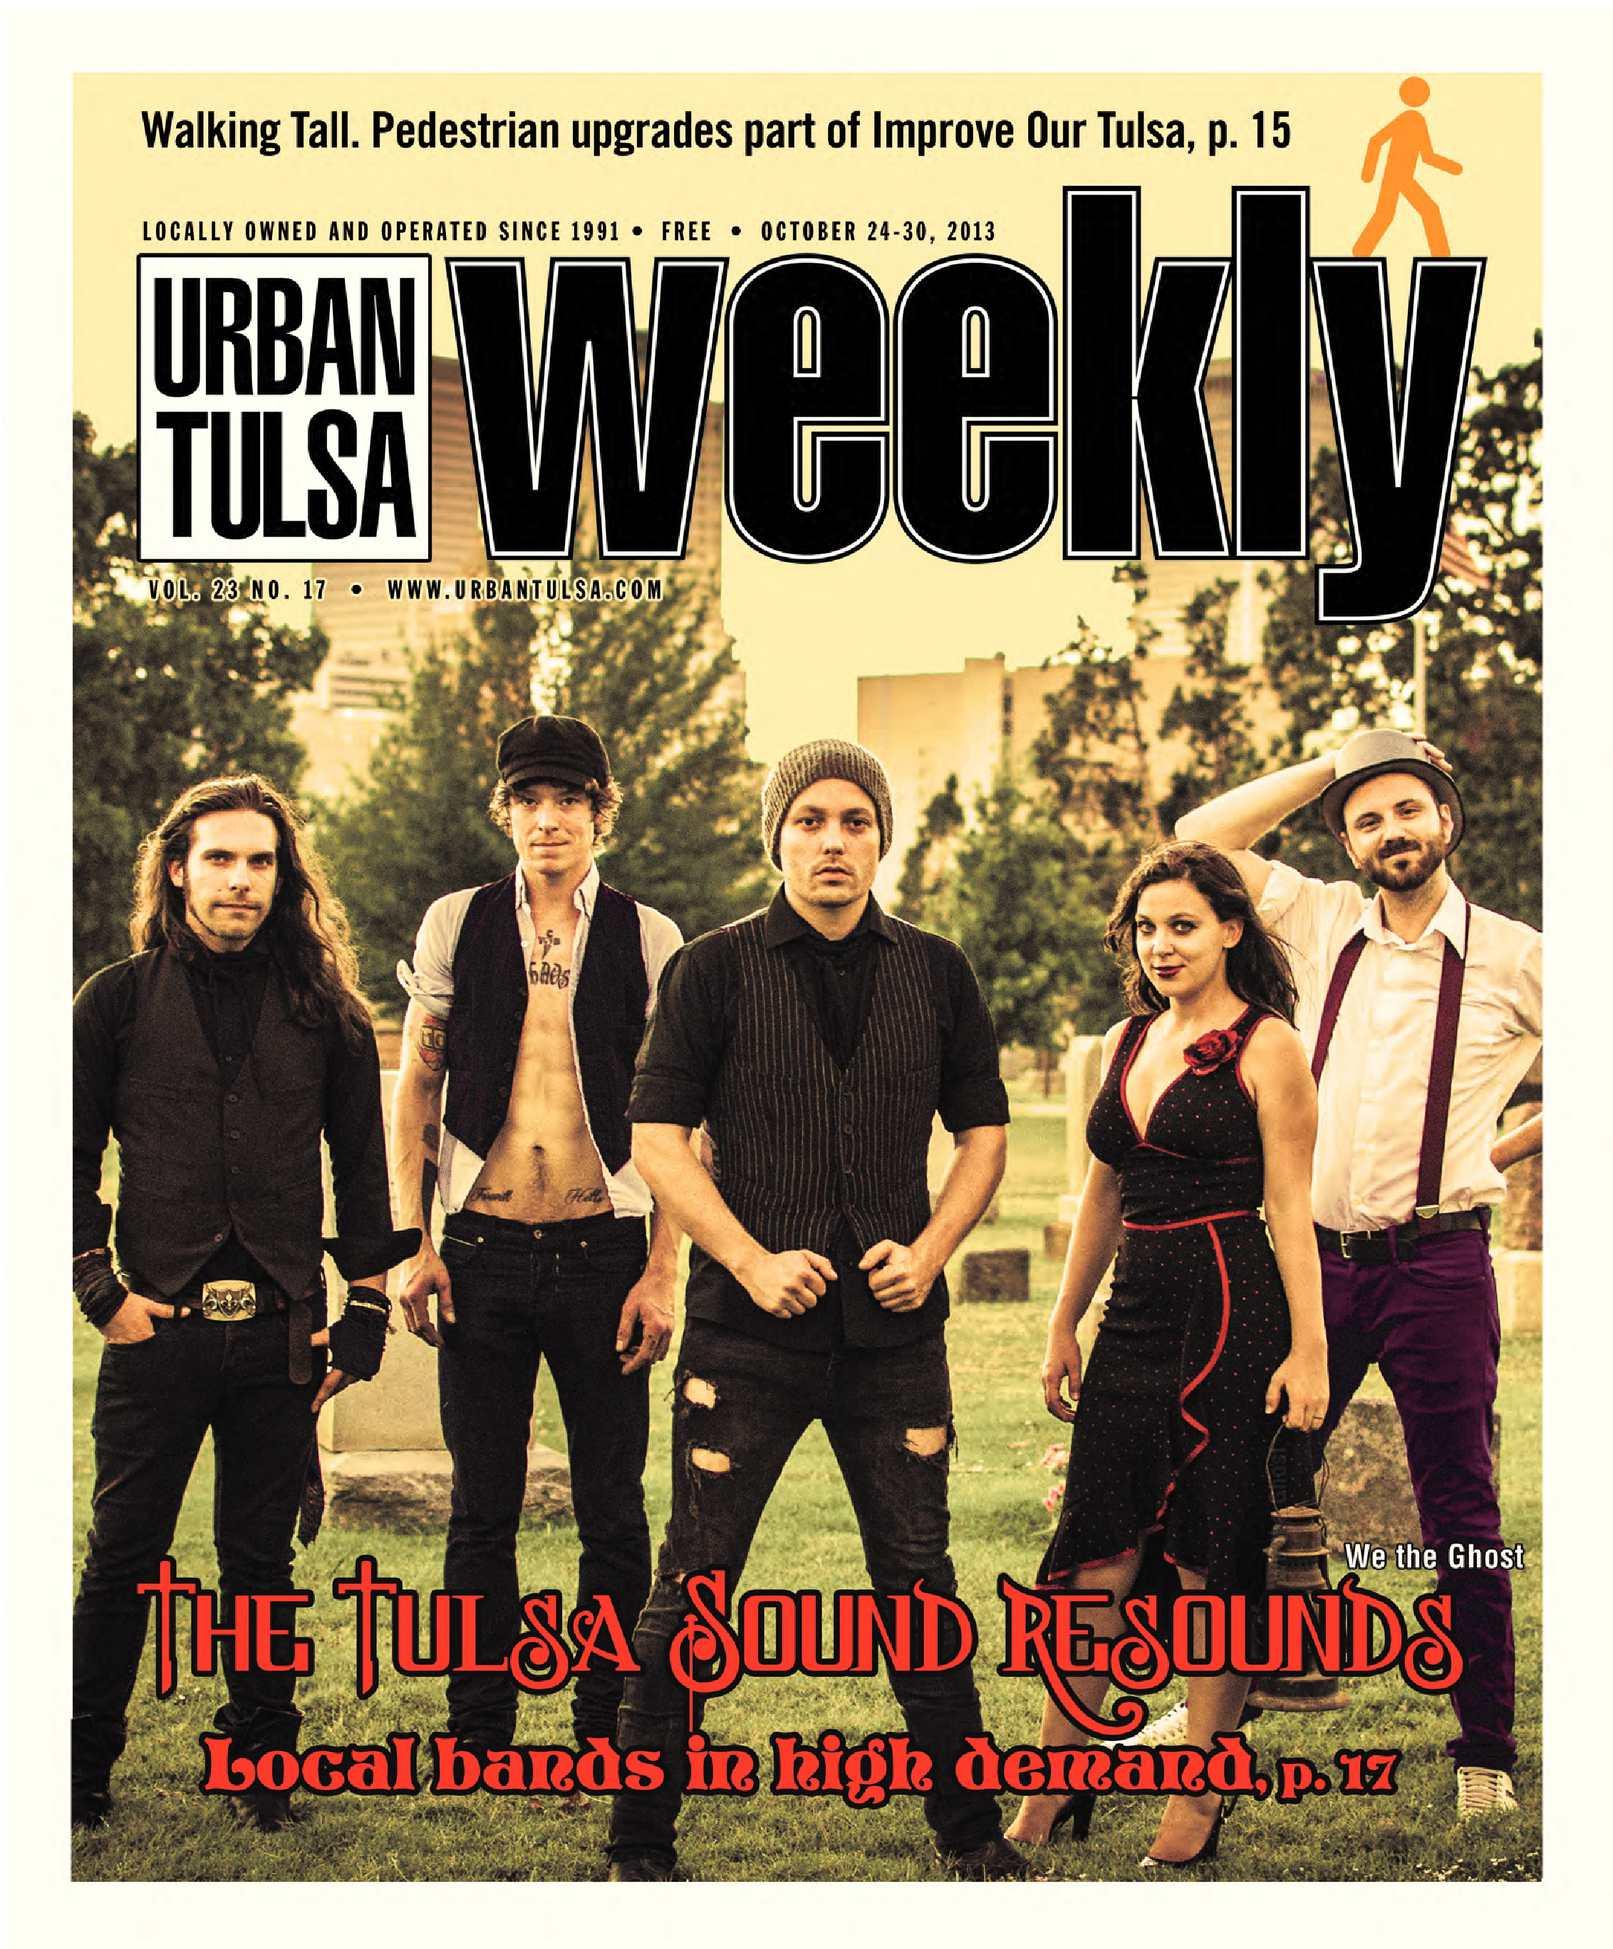 Calamo Urban Tulsa Weekly October 24 30 2013